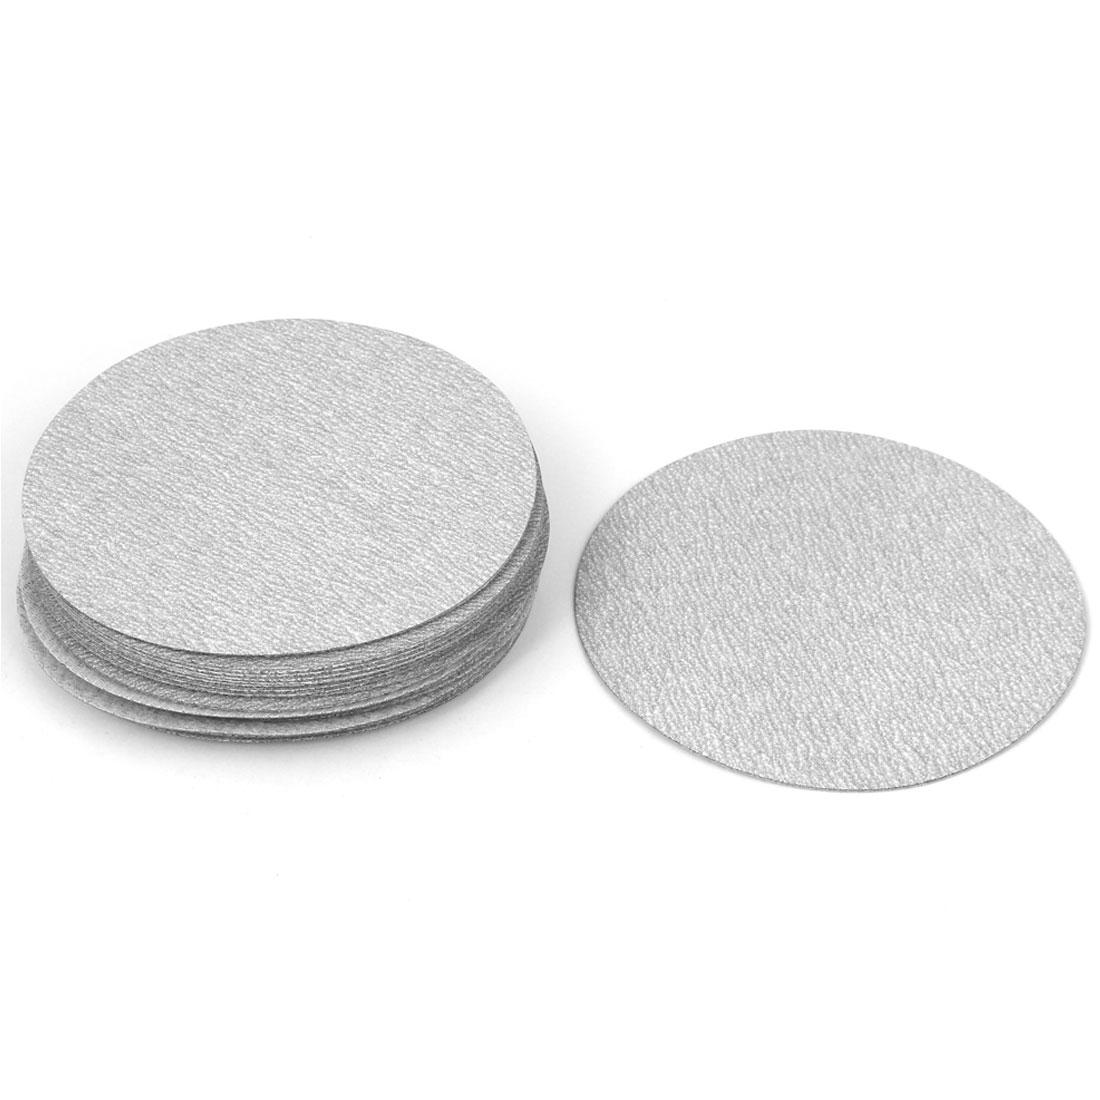 "4"" Dia Polishing Round Sanding Sandpaper Disc 320 Grit 20 Pcs"